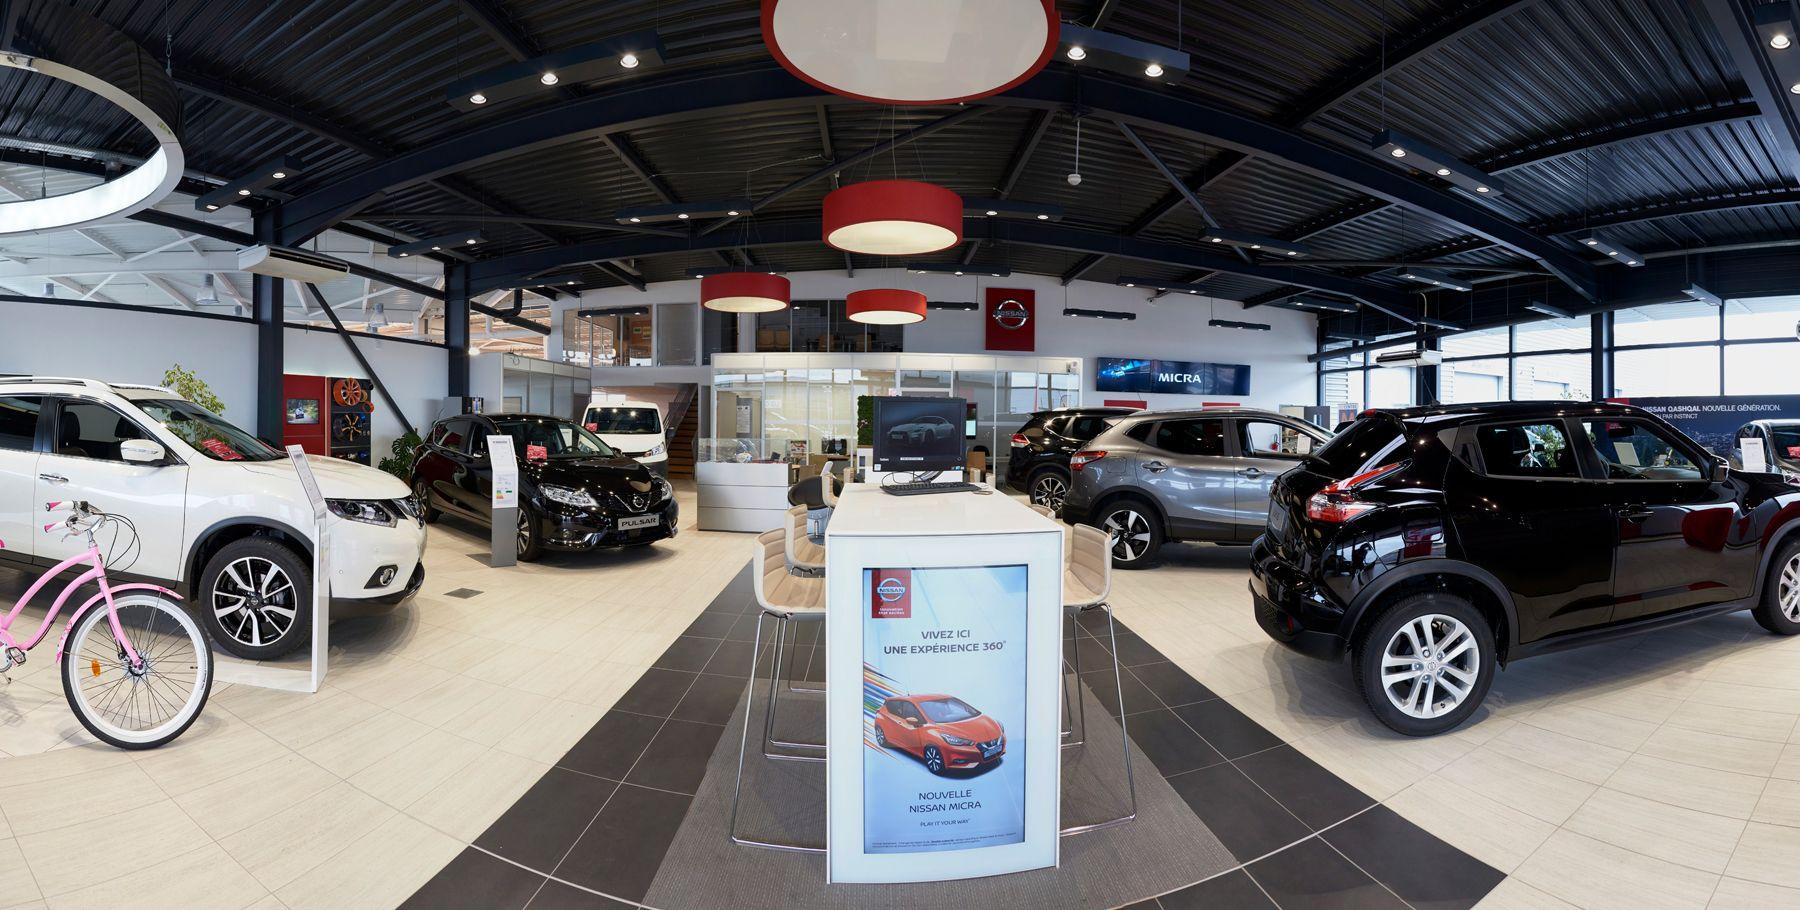 nissan carcassonne vous propose 60 voitures l 39 achat. Black Bedroom Furniture Sets. Home Design Ideas